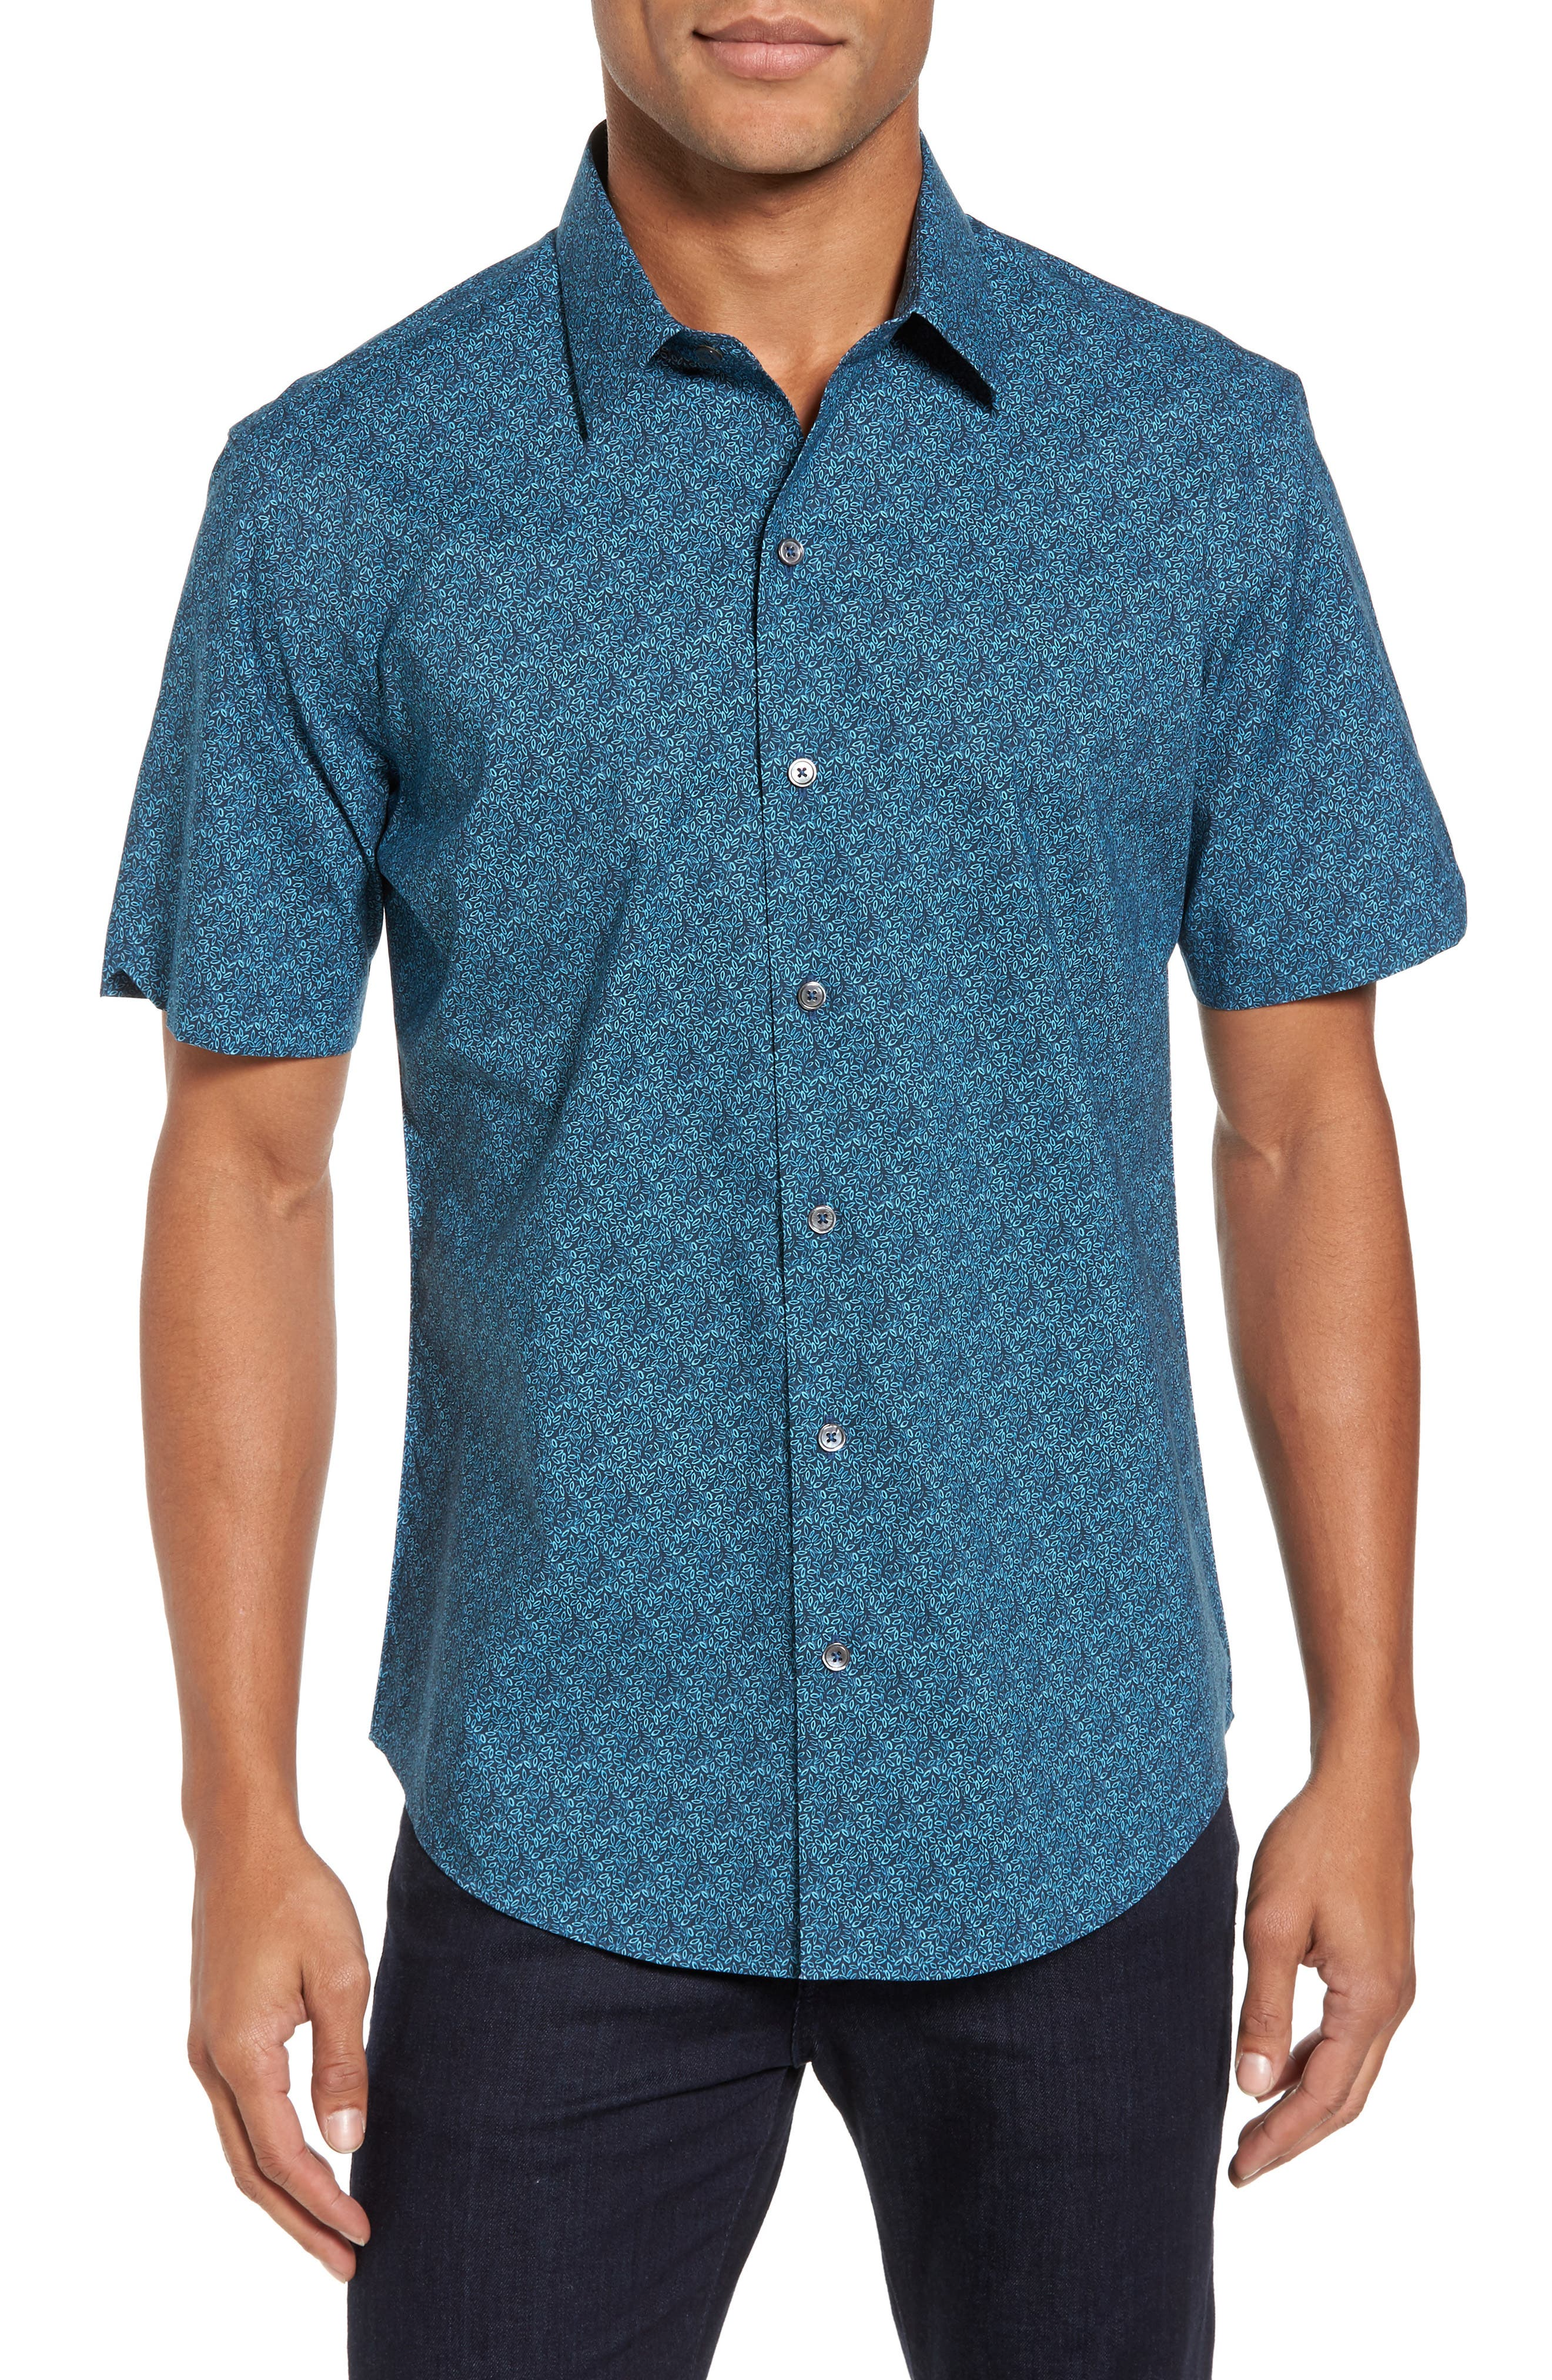 Main Image - Zachary Prell Machnee Slim Fit Print Sport Shirt